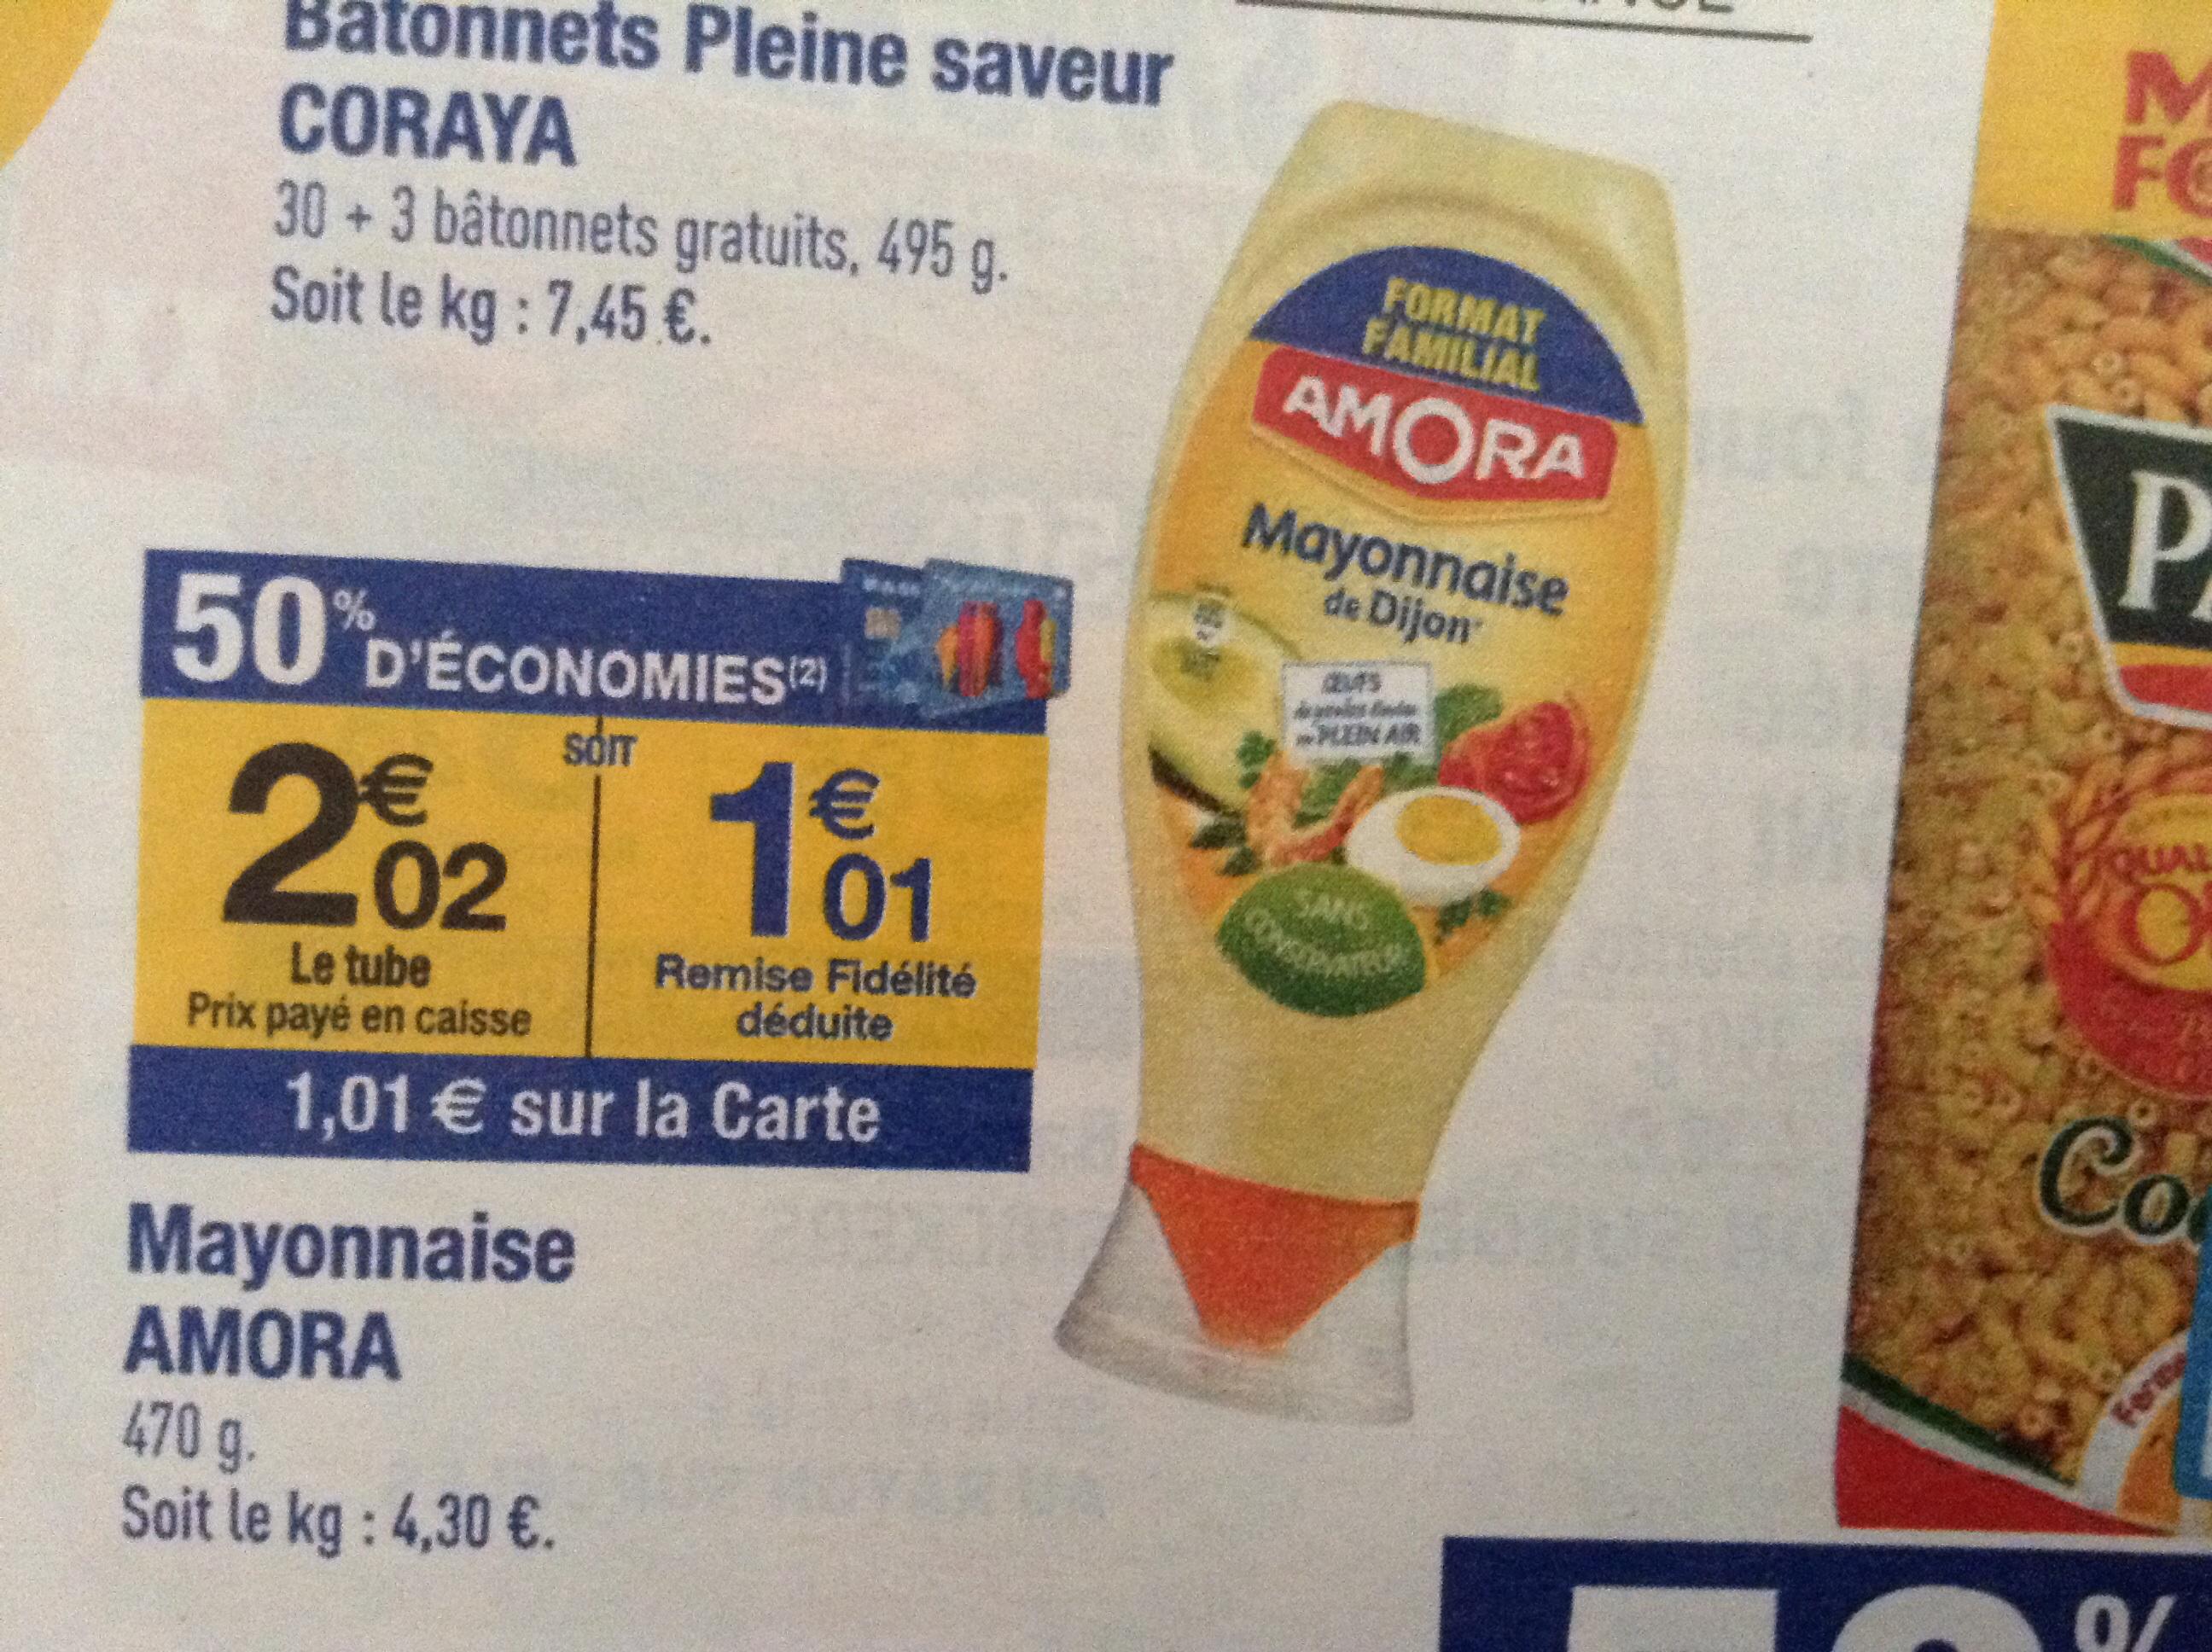 Mayonnaise Amora 470g